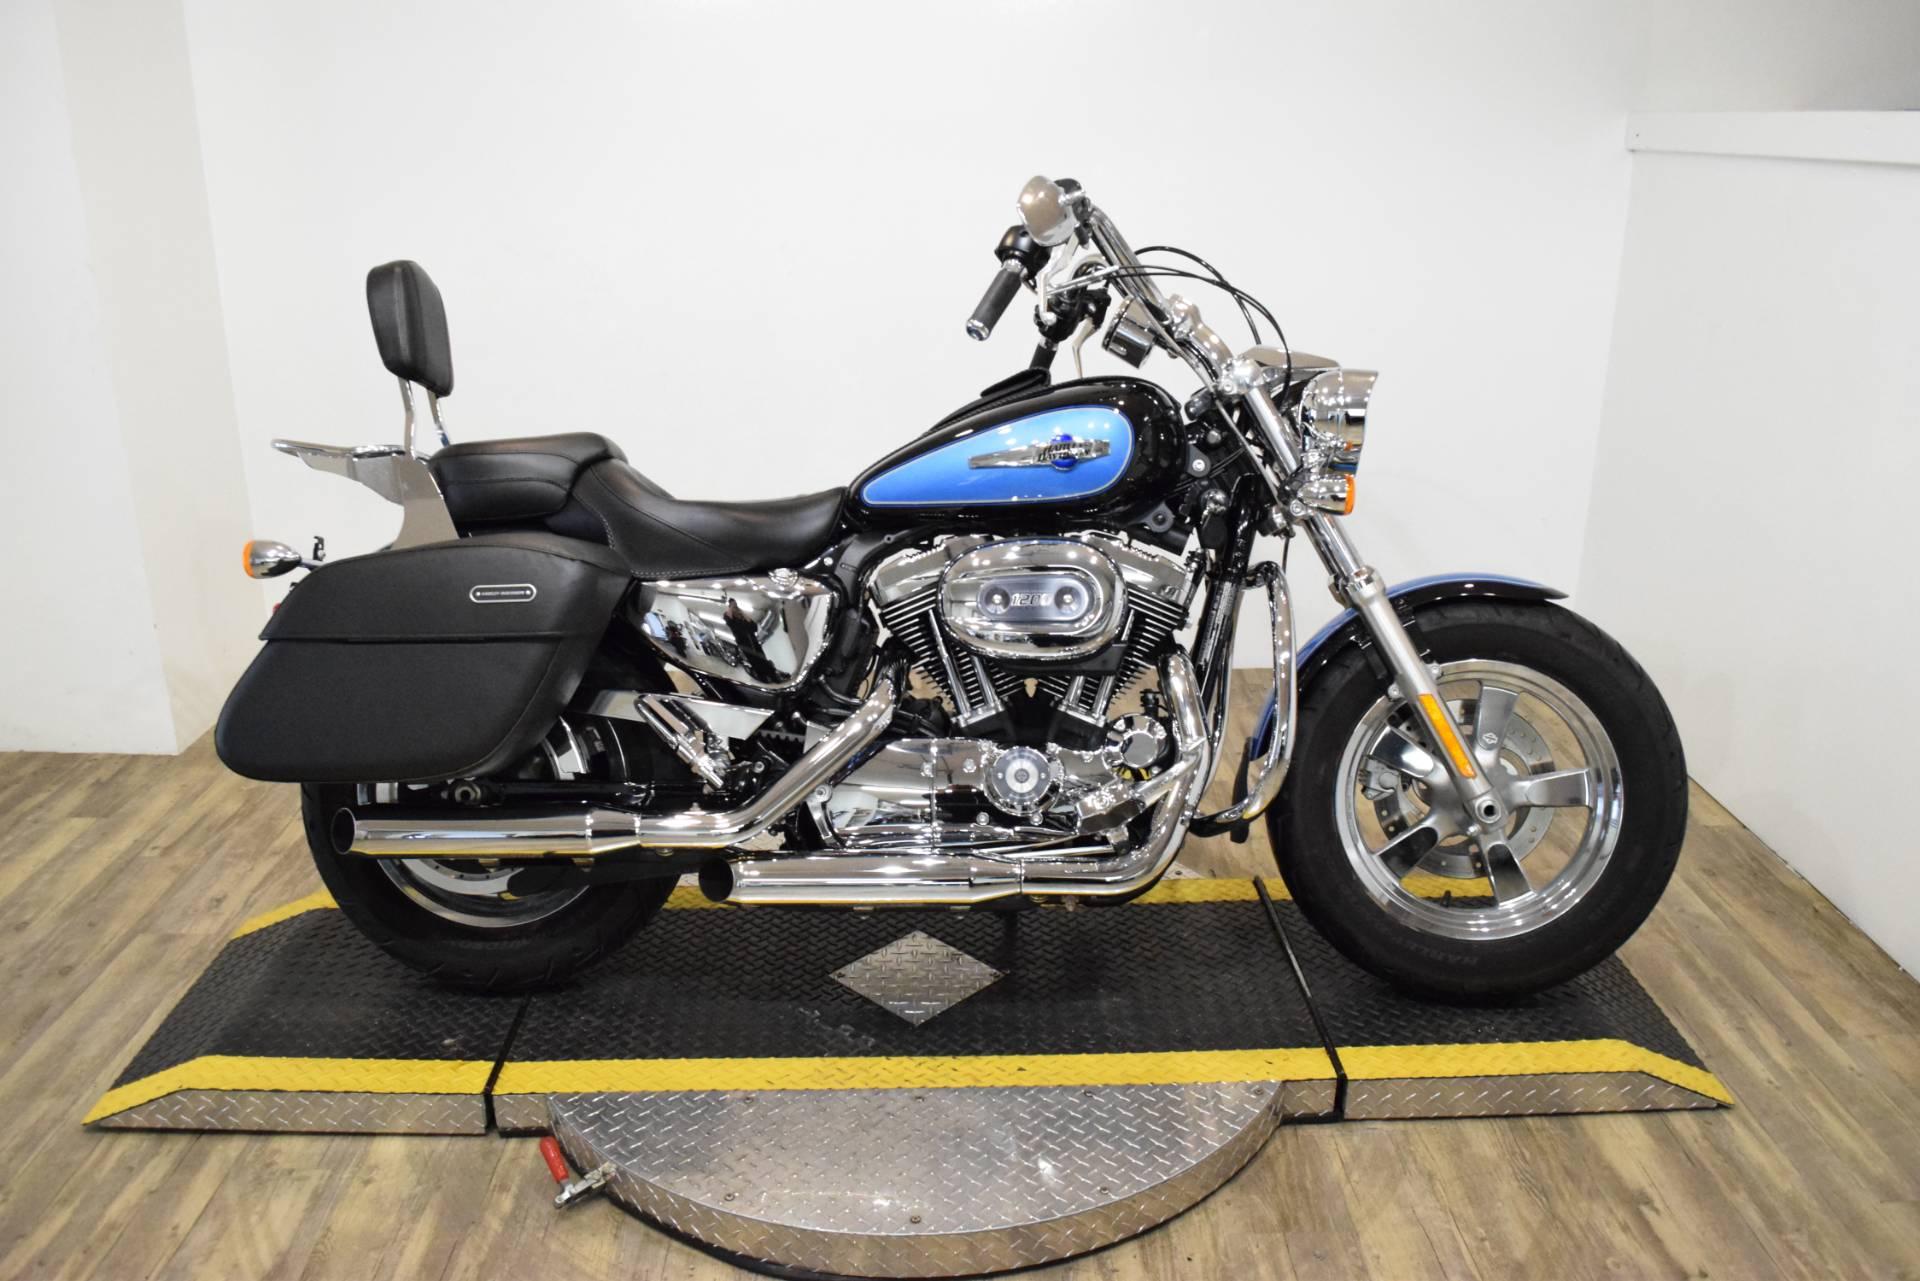 2012 Harley-Davidson XL1200C 1